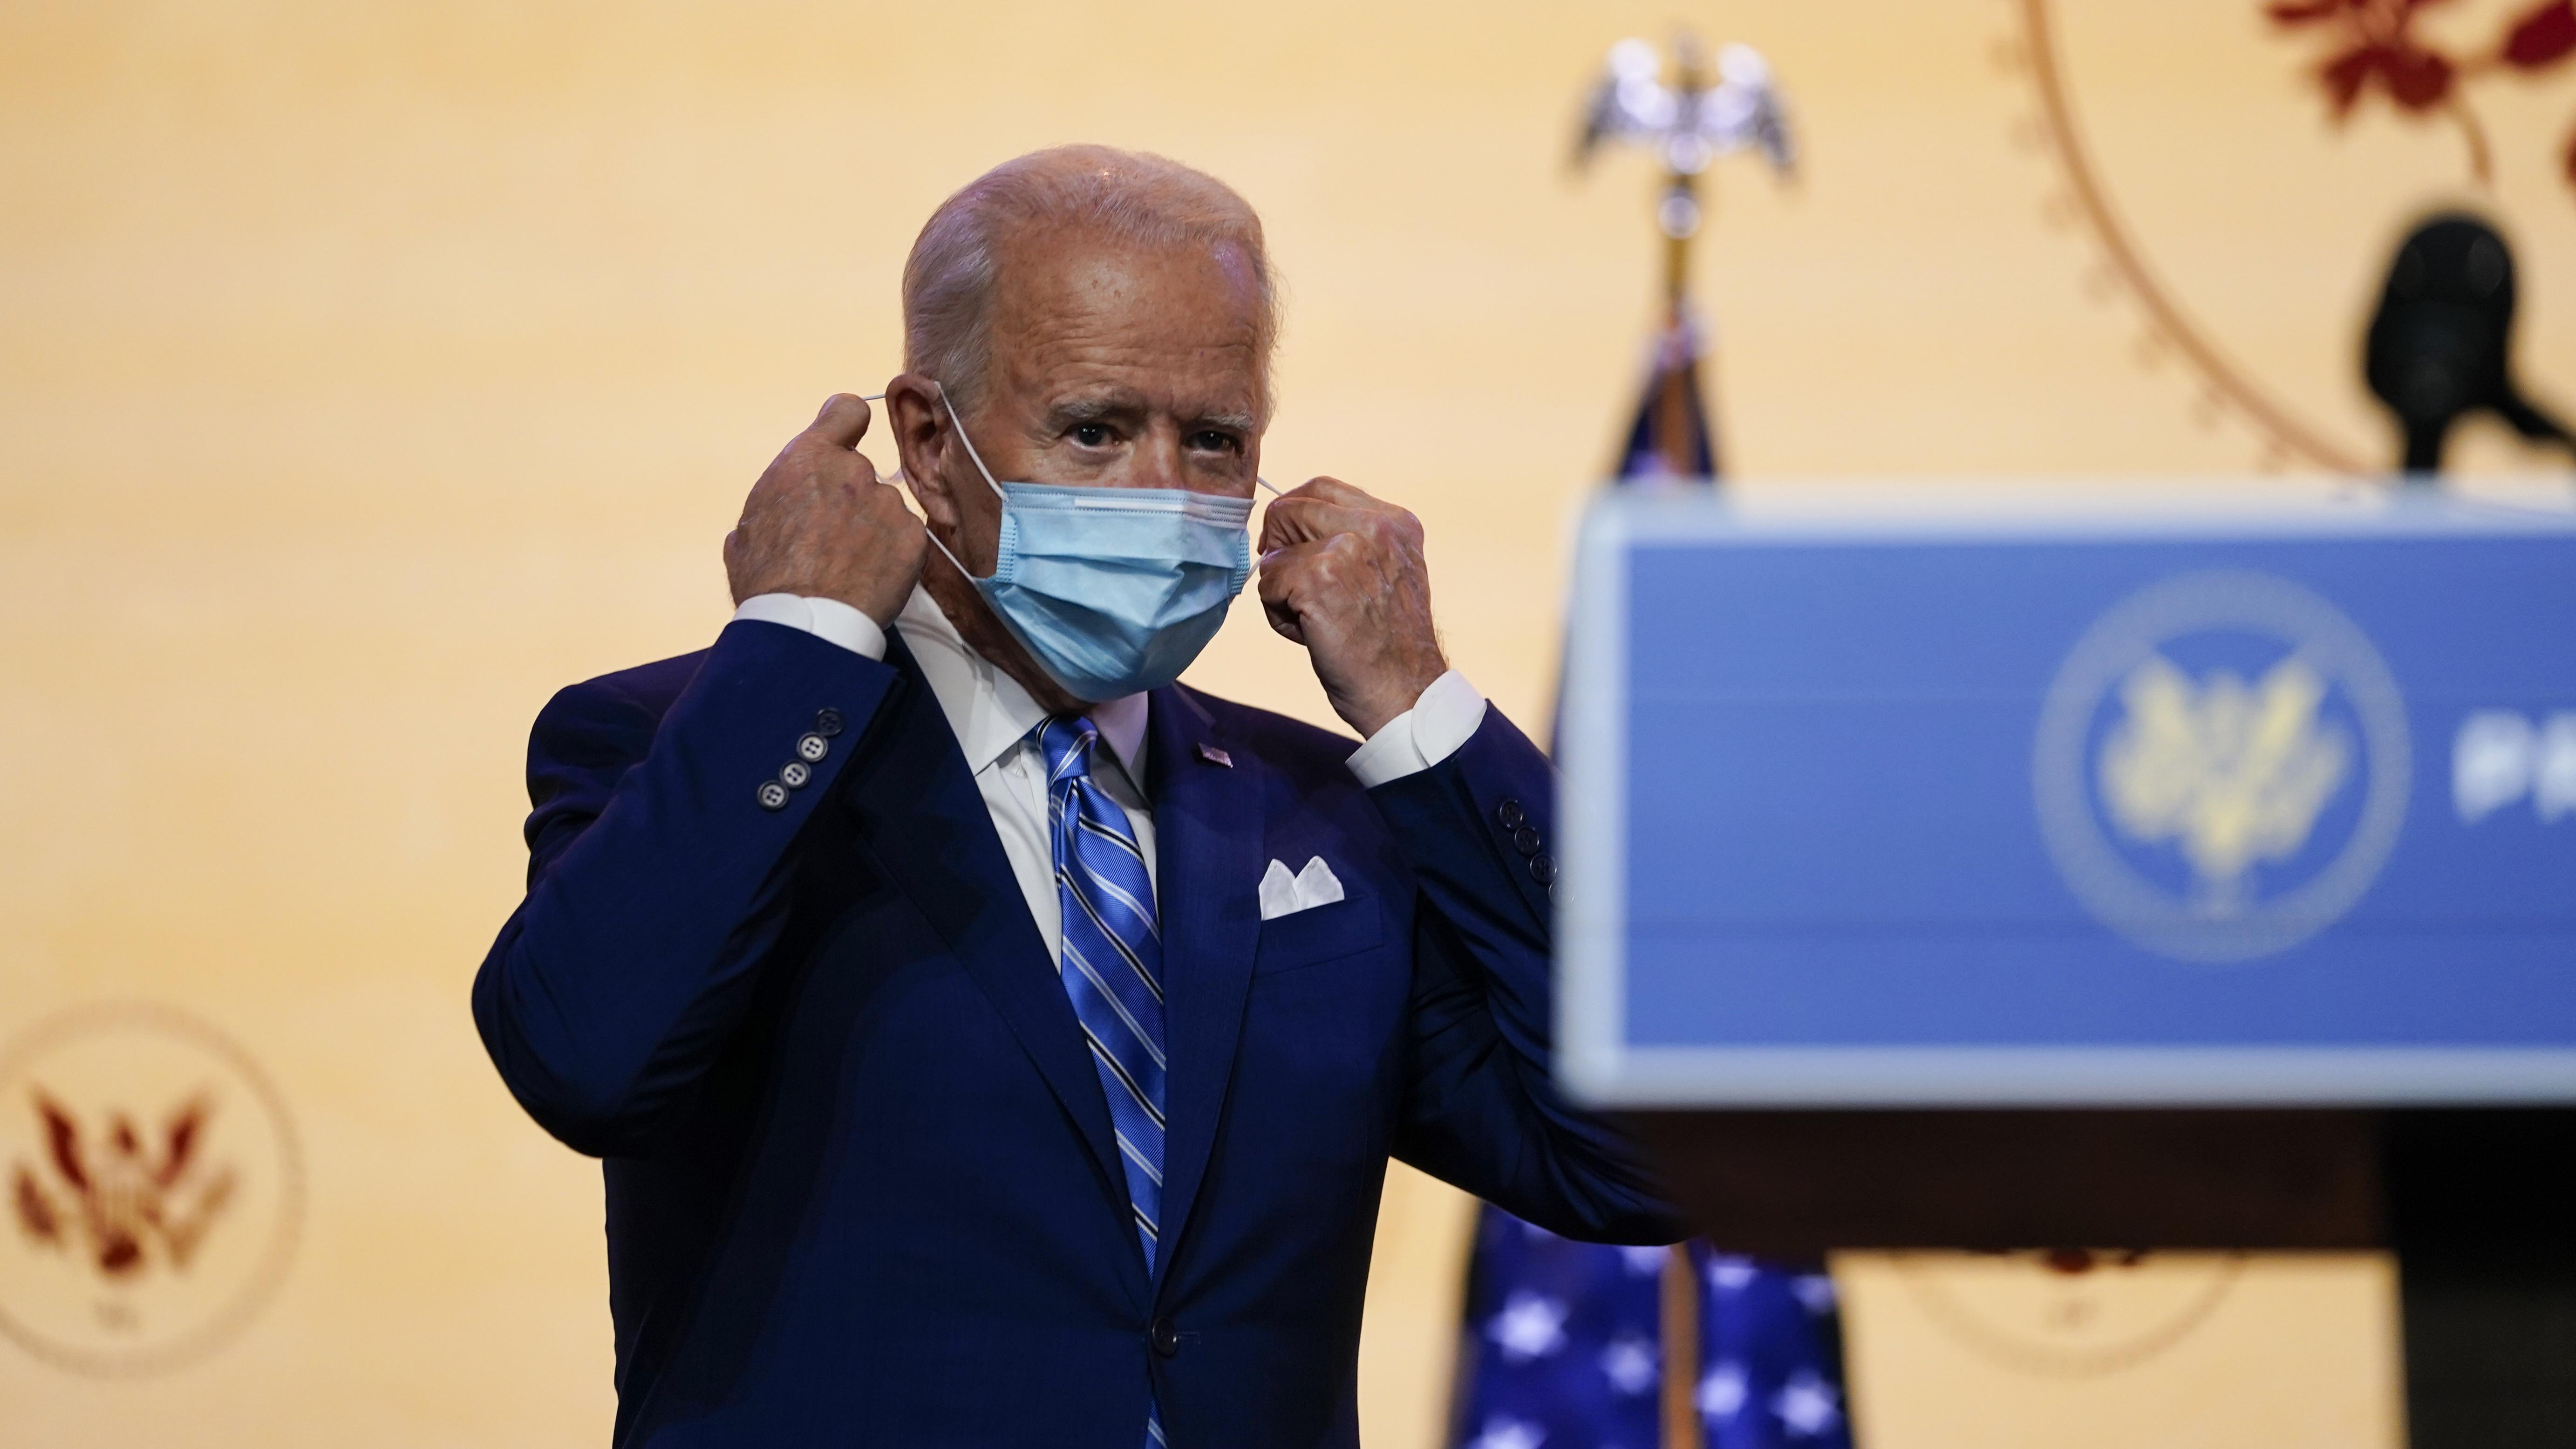 Biden faces test over sharing Trump's secret calls